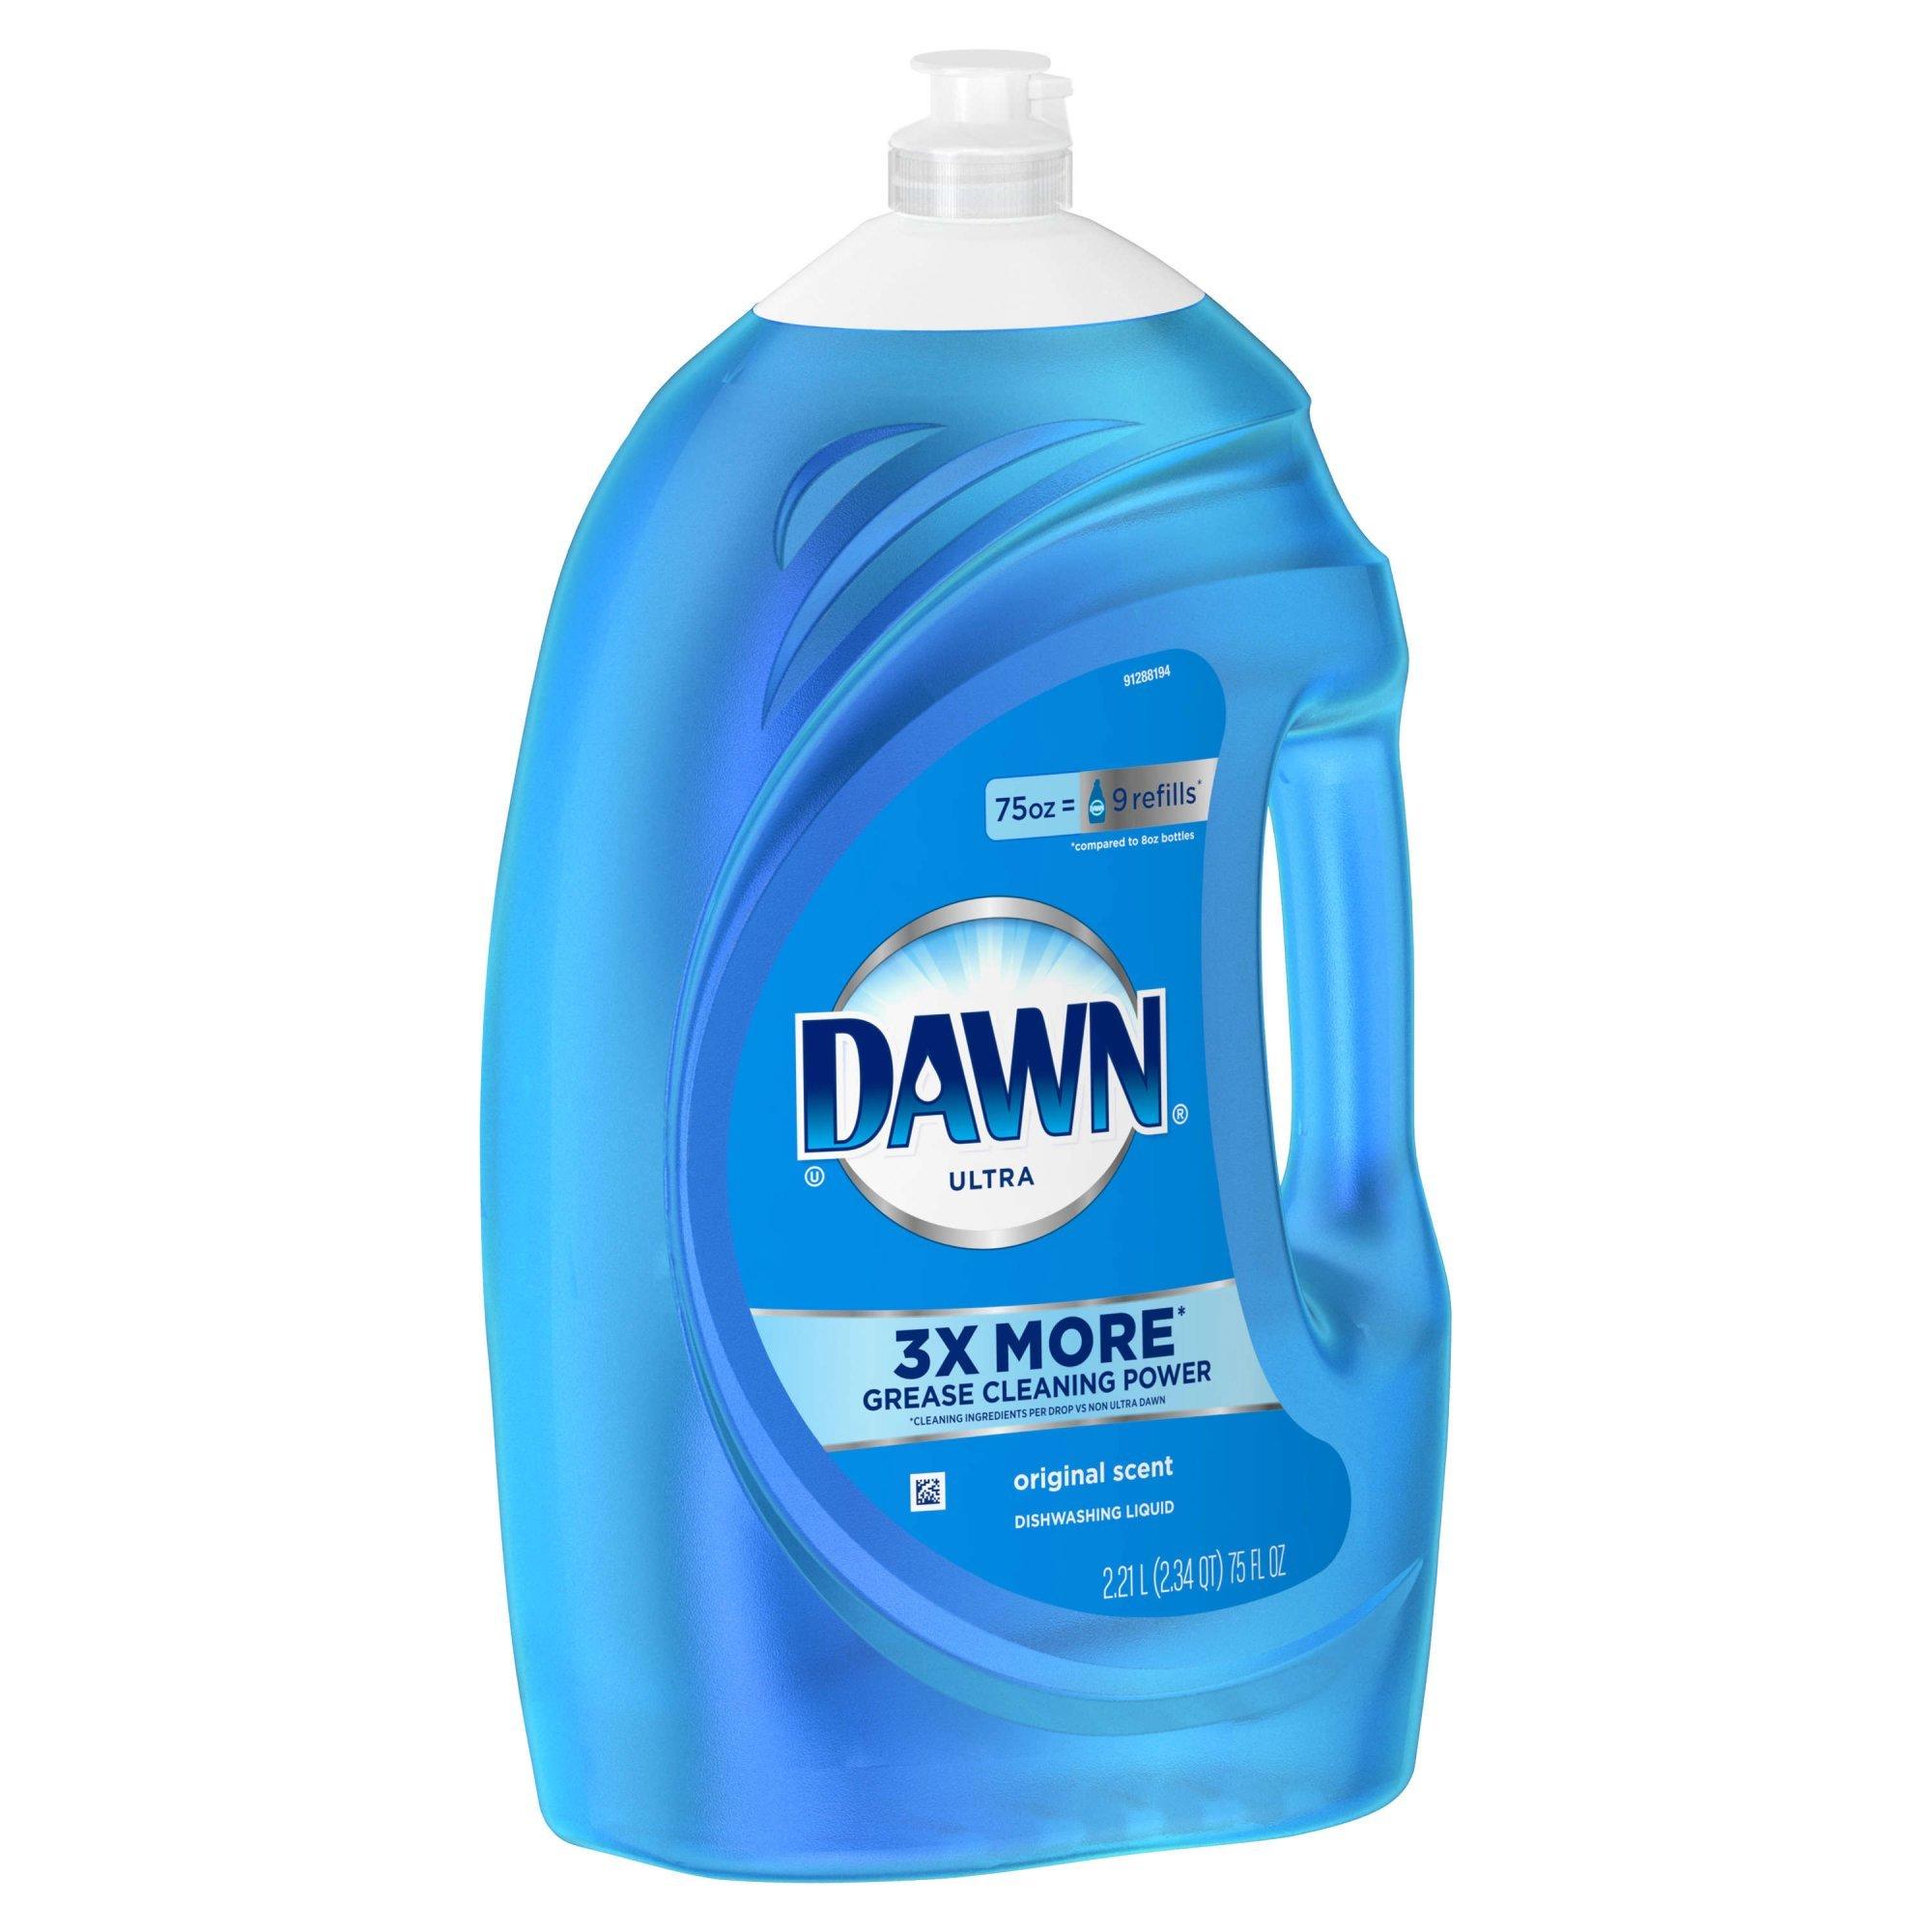 Dawn Ultra Dishwashing Liquid Dish Soap, Original Scent, 75 Fluid Ounce